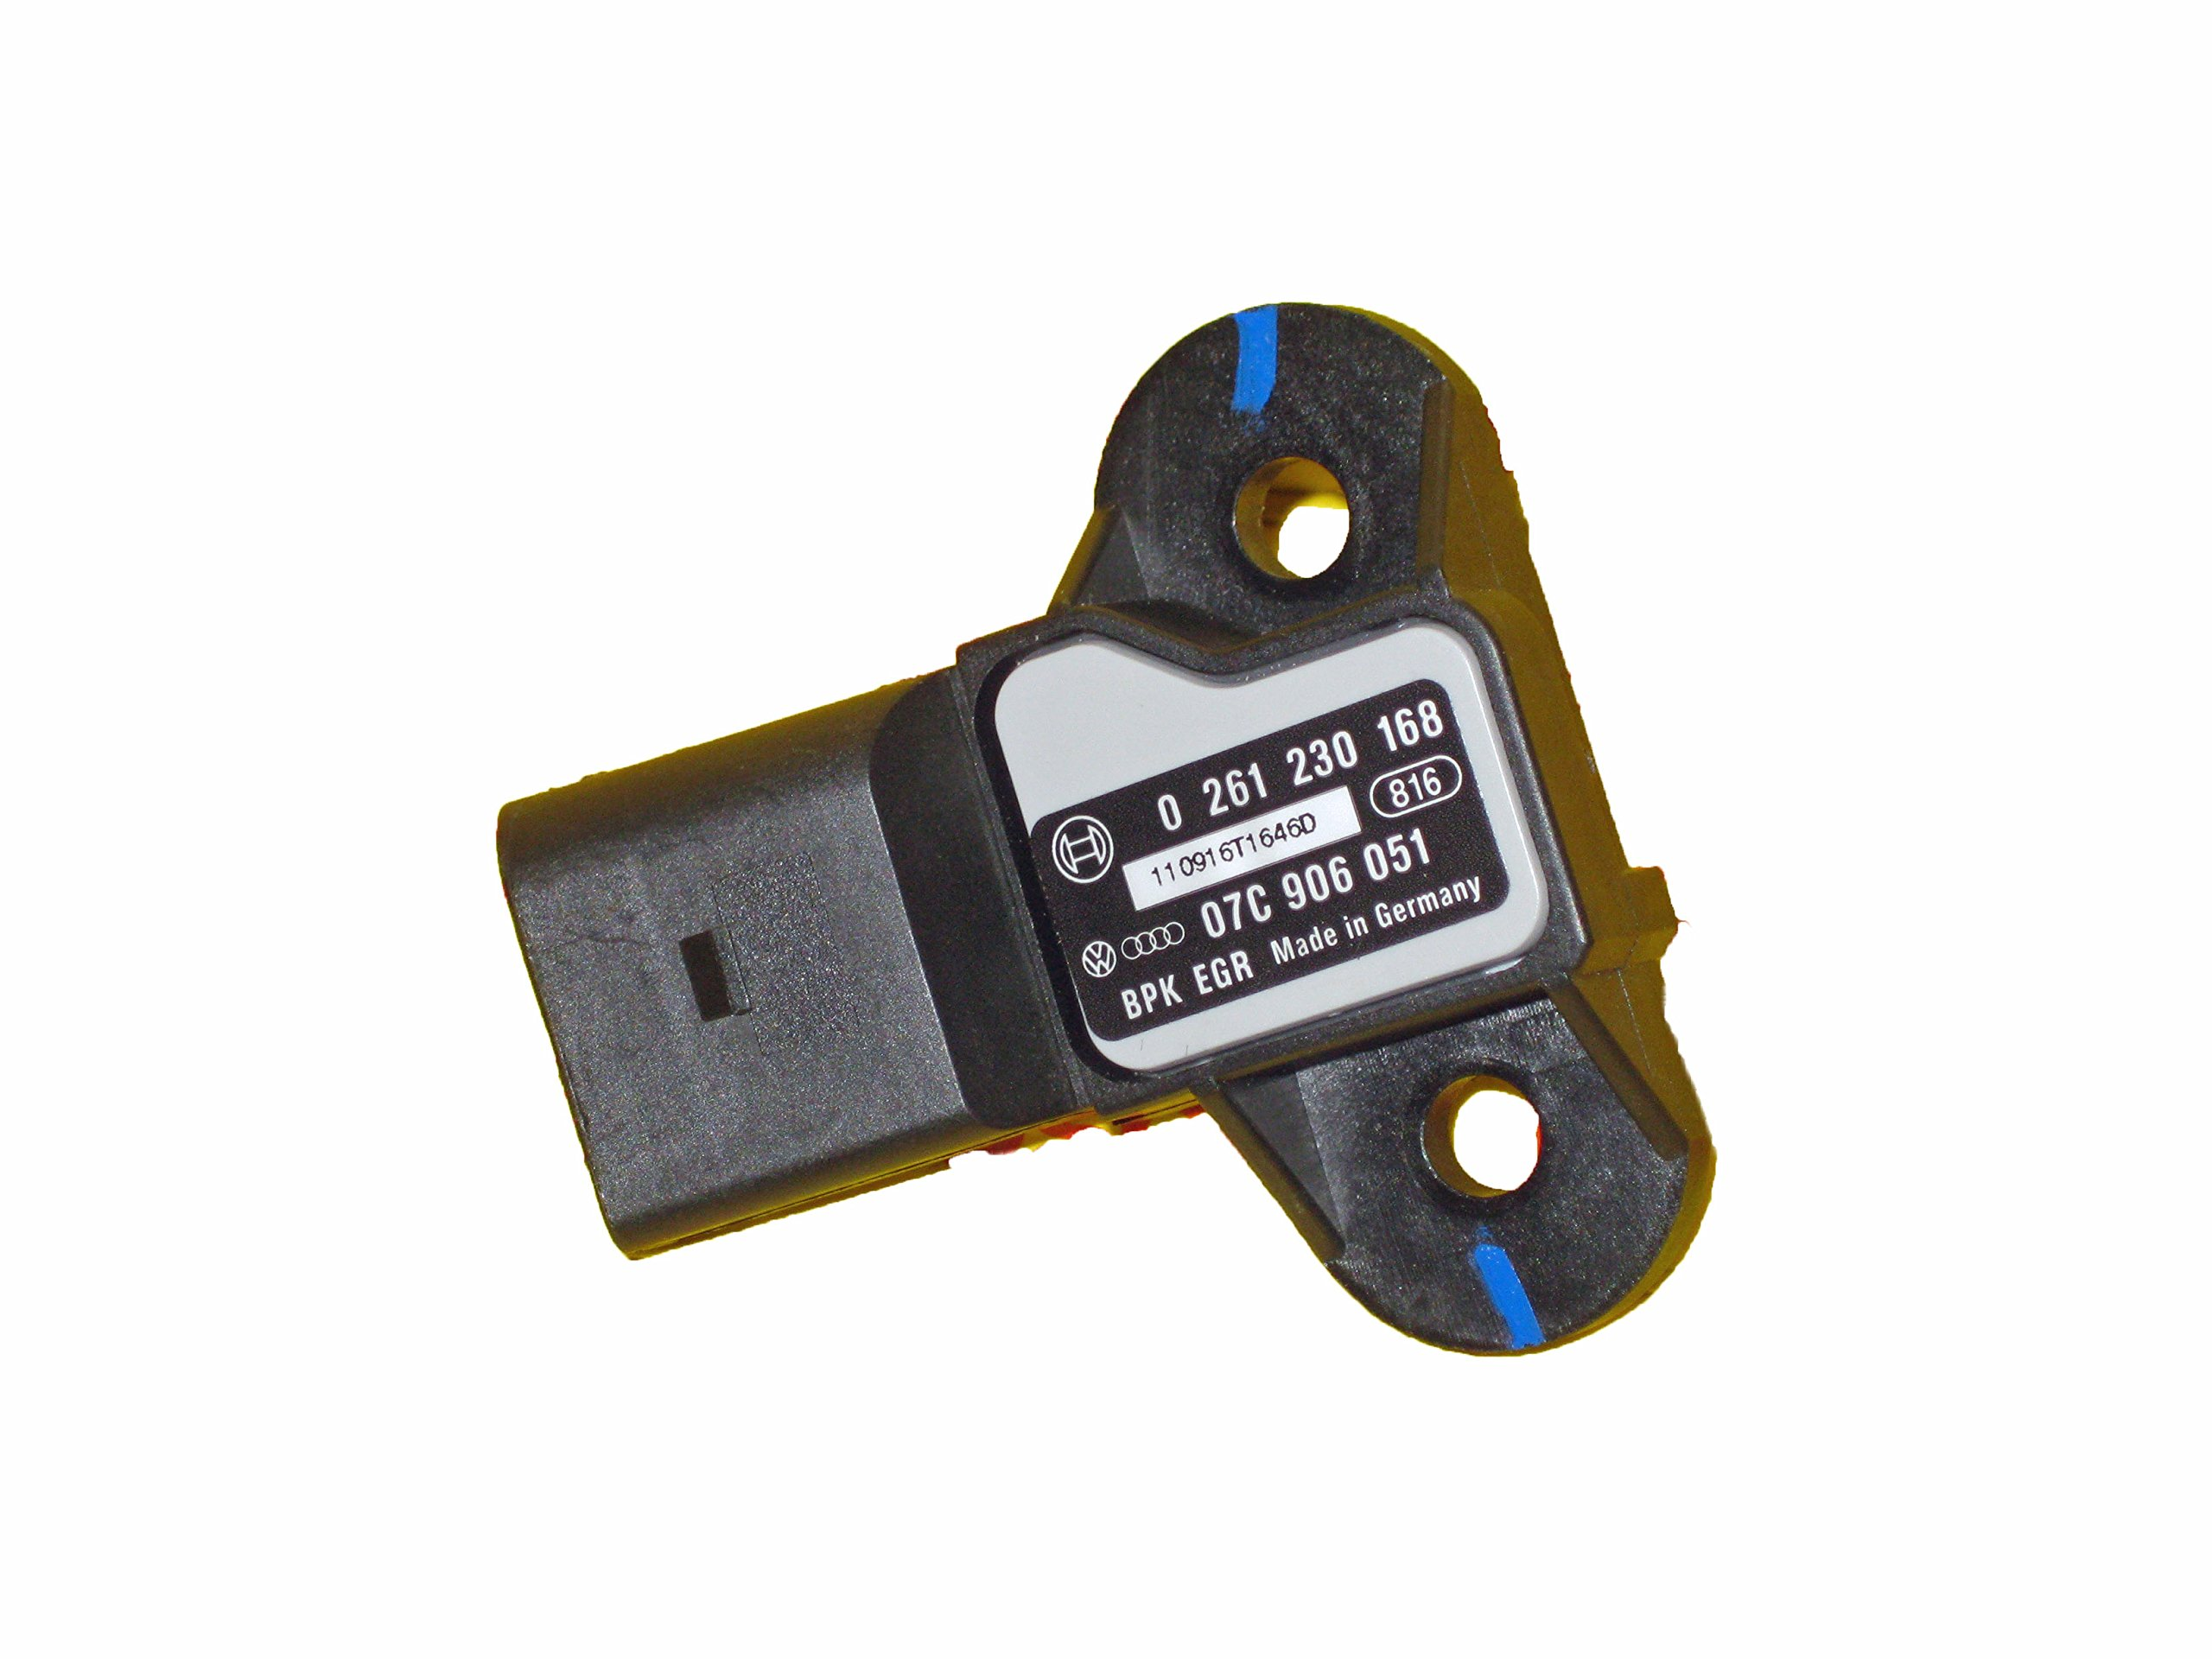 Volkswagen 07C 906 051, Manifold Absolute Pressure Sensor